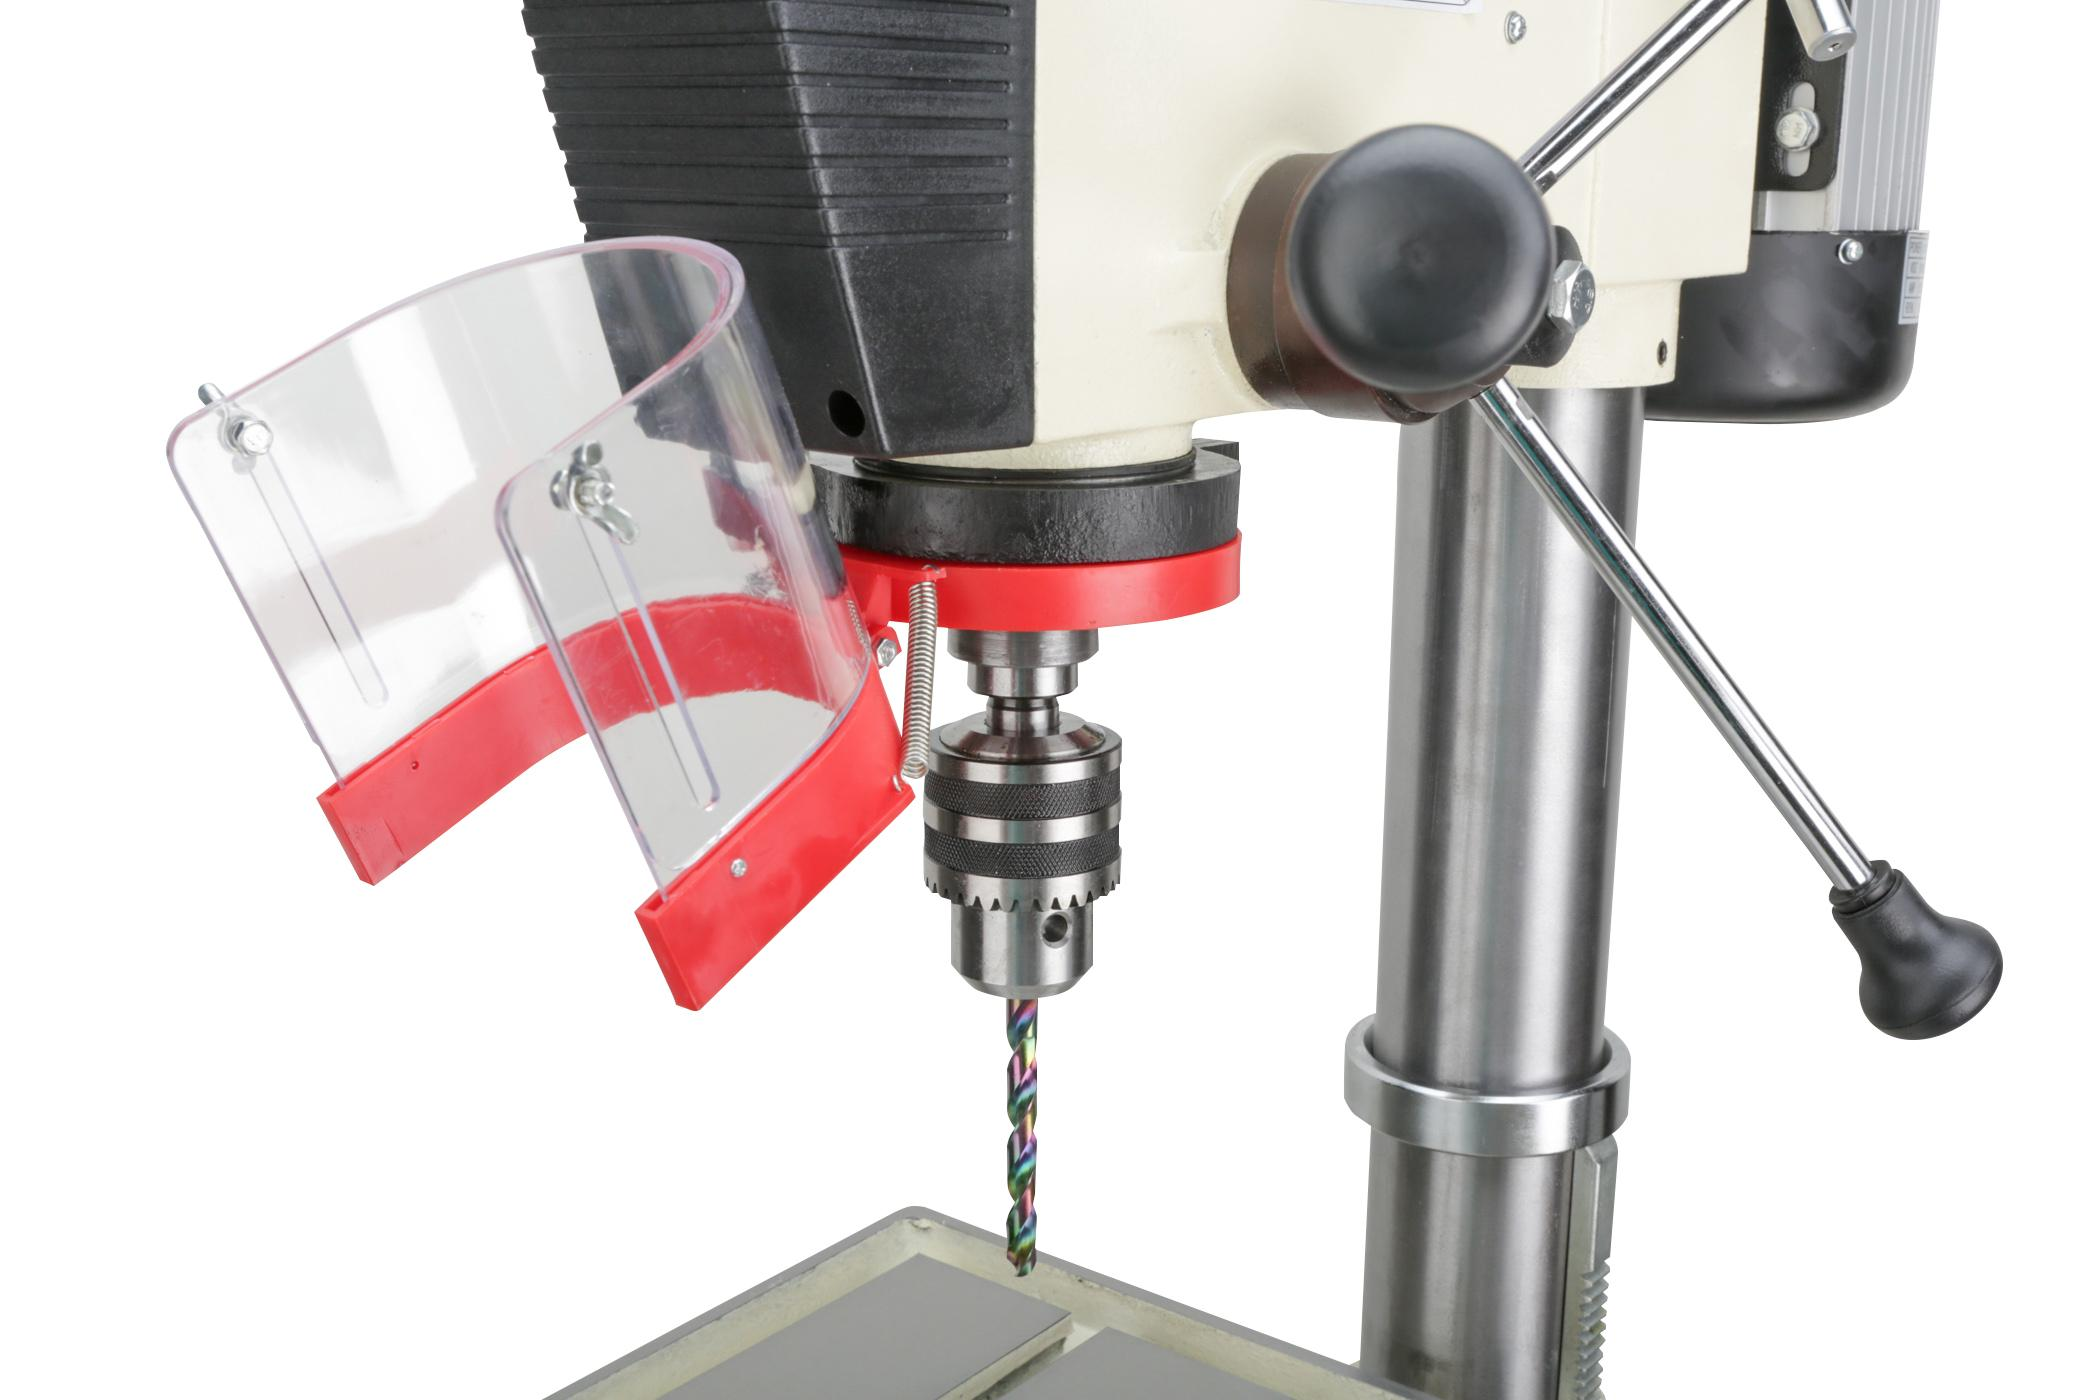 Shop Fox M1039 20 Inch Drill Press Amazon Ca Tools